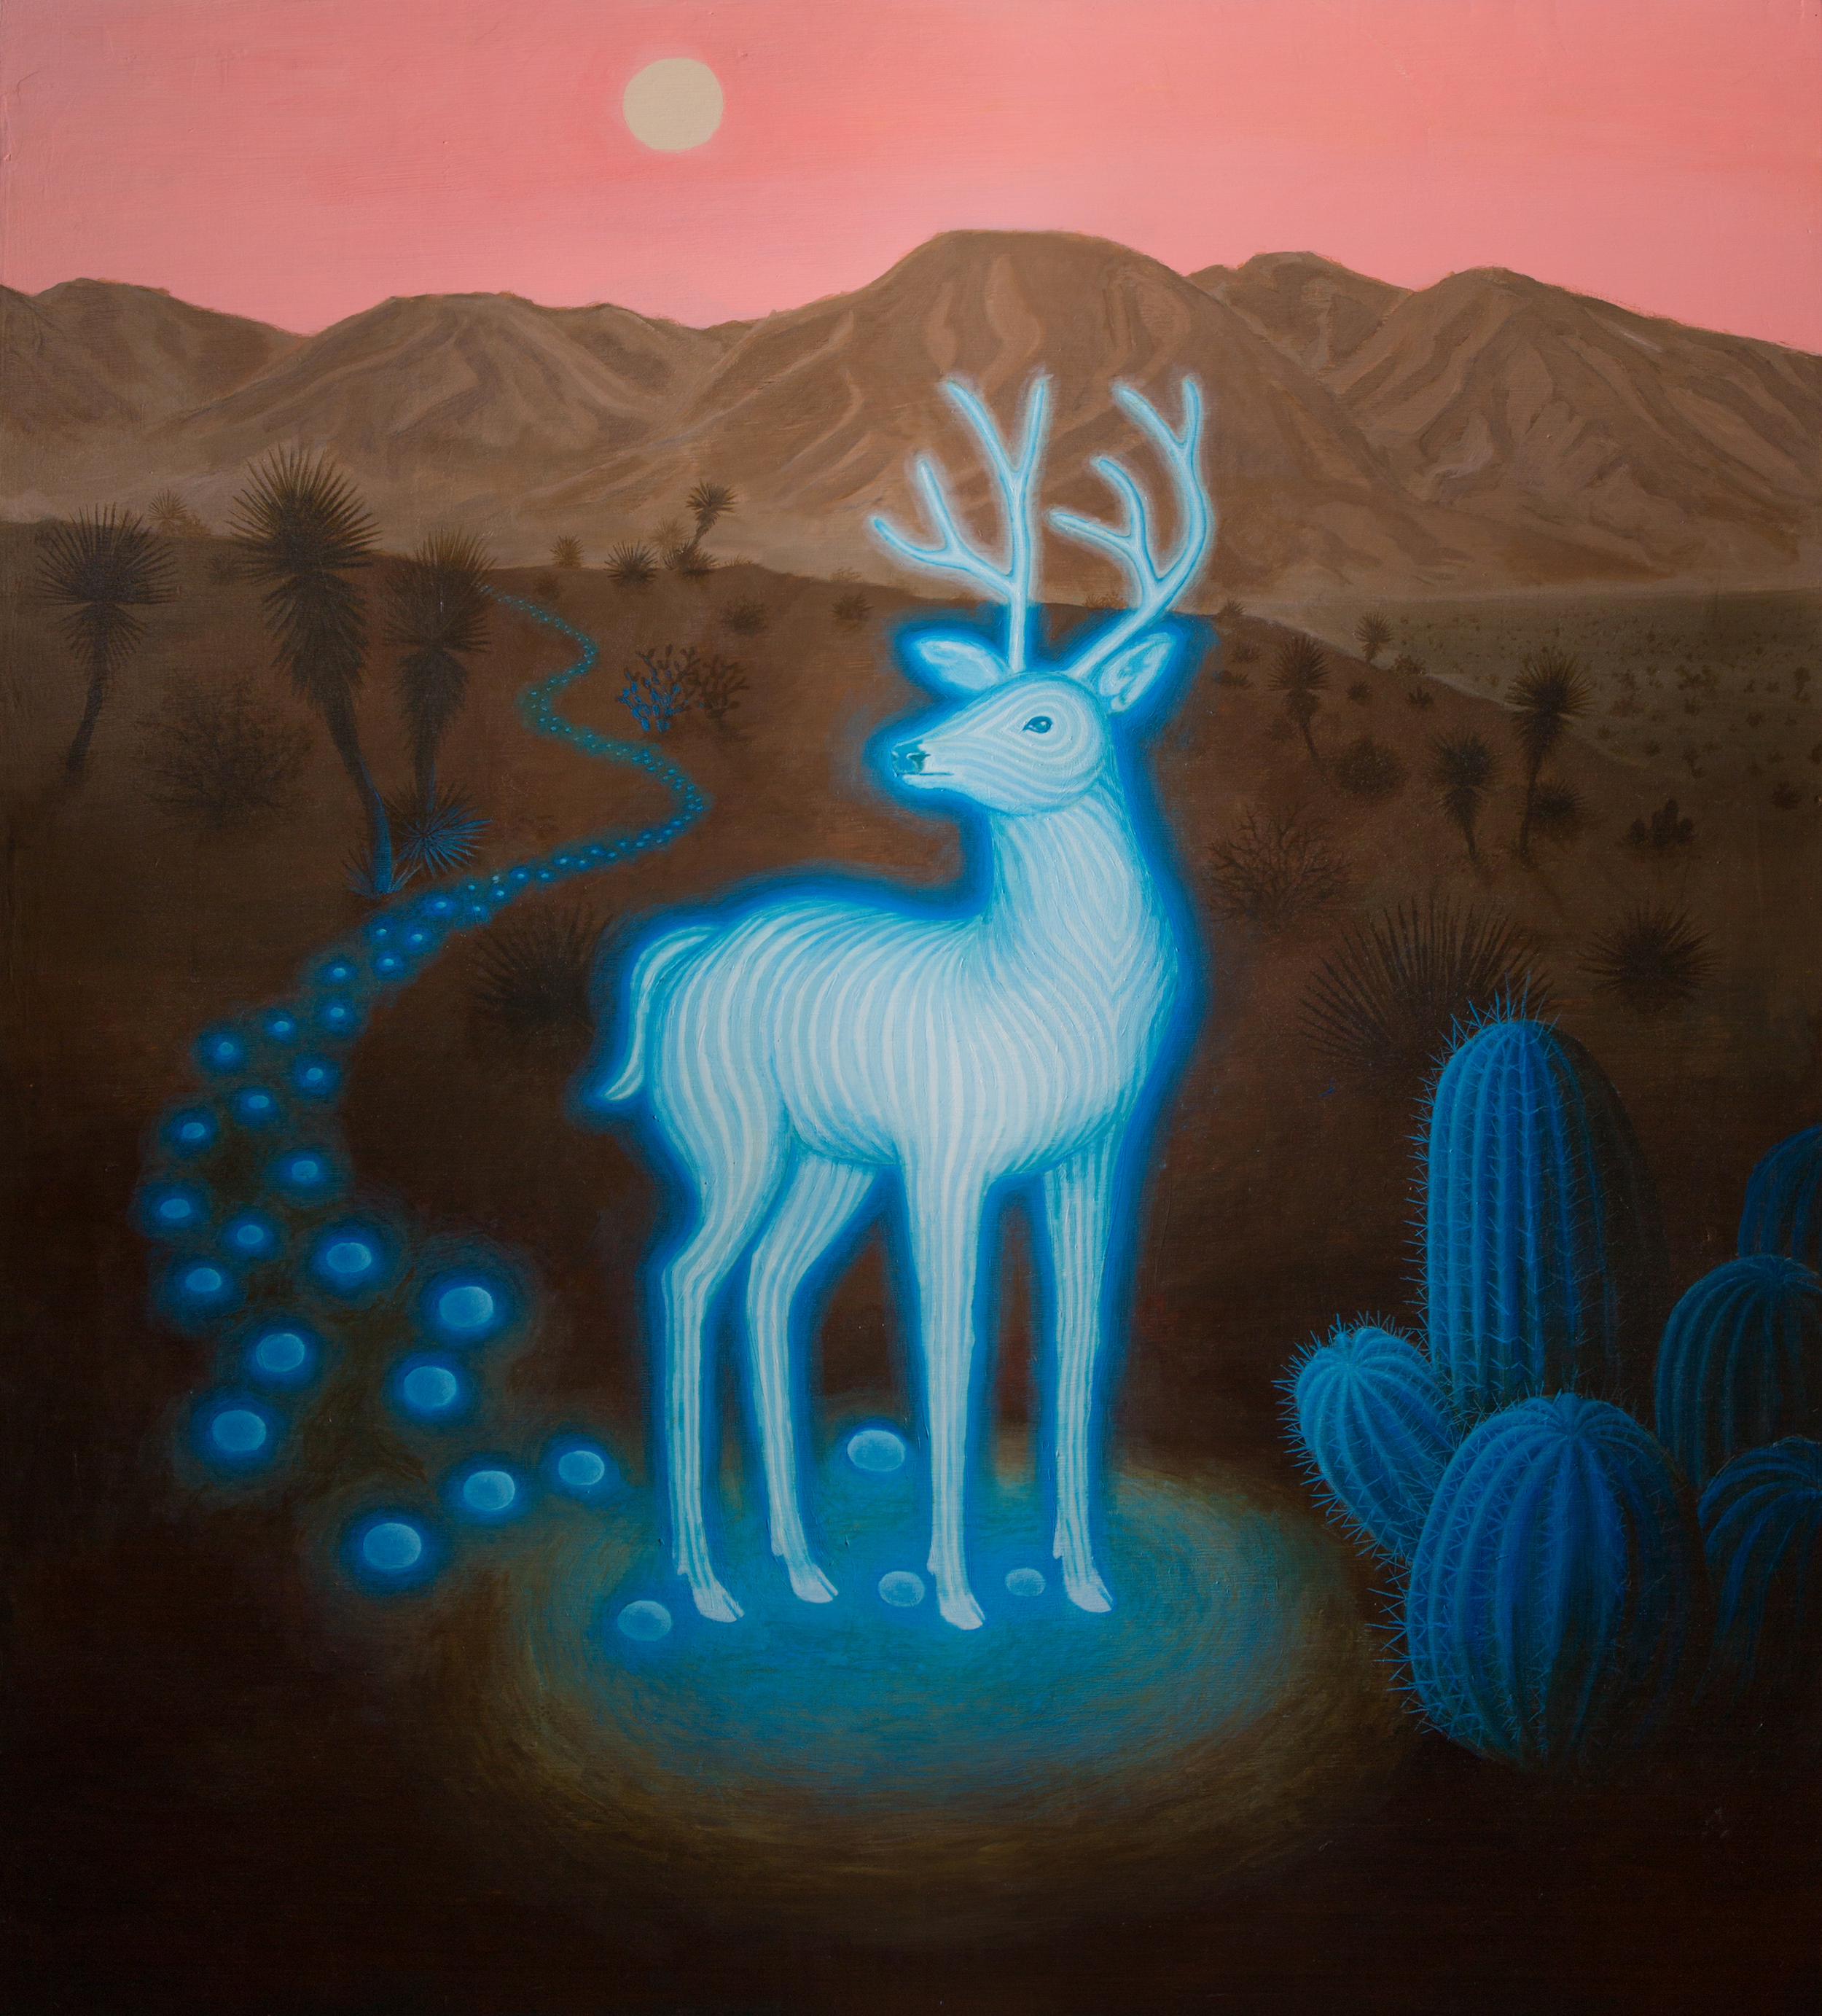 blue-deer-drums-painting-brooklyn-shamanic-sound-healing-bath-workshop-bag-ceremony-drumstick-spirit